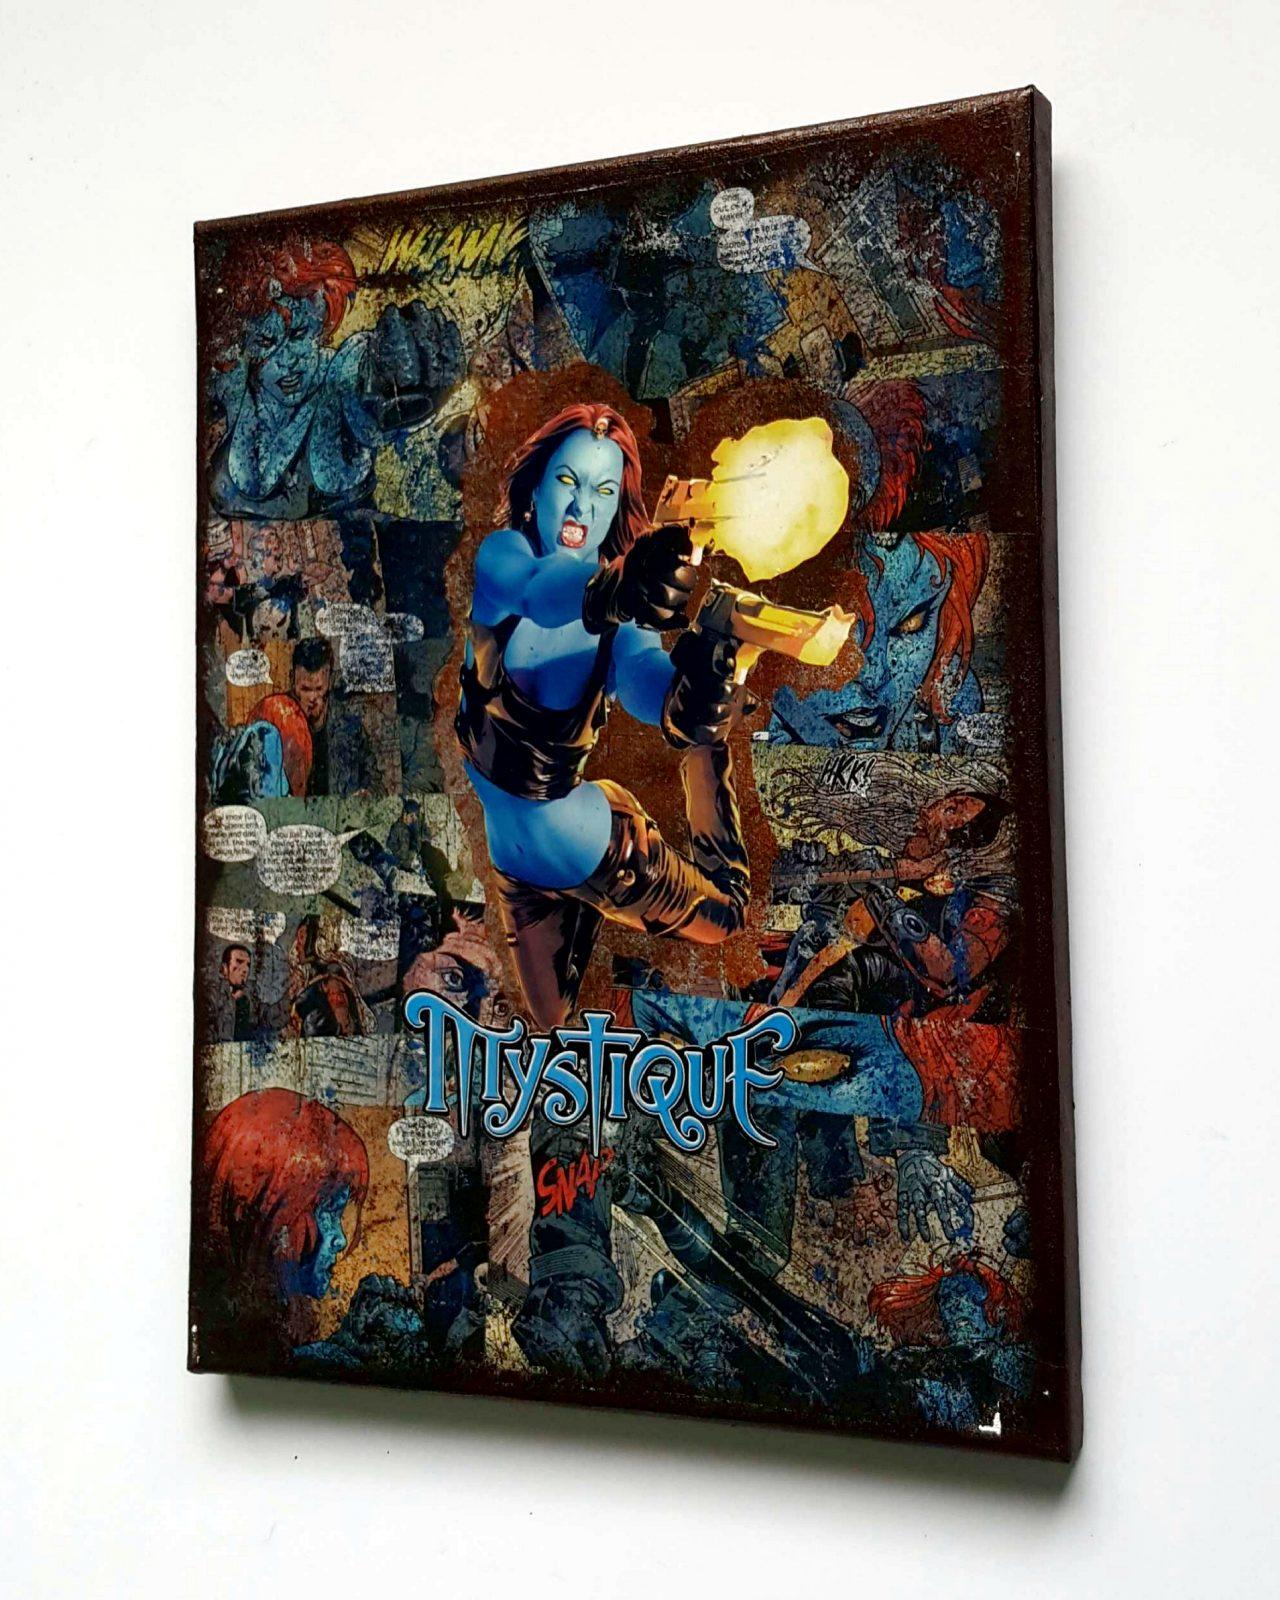 Mystique   Marvel Graphic Canvas By StarkeMatter   Superhero Comic Book Home  Decor Wall Art Canvas